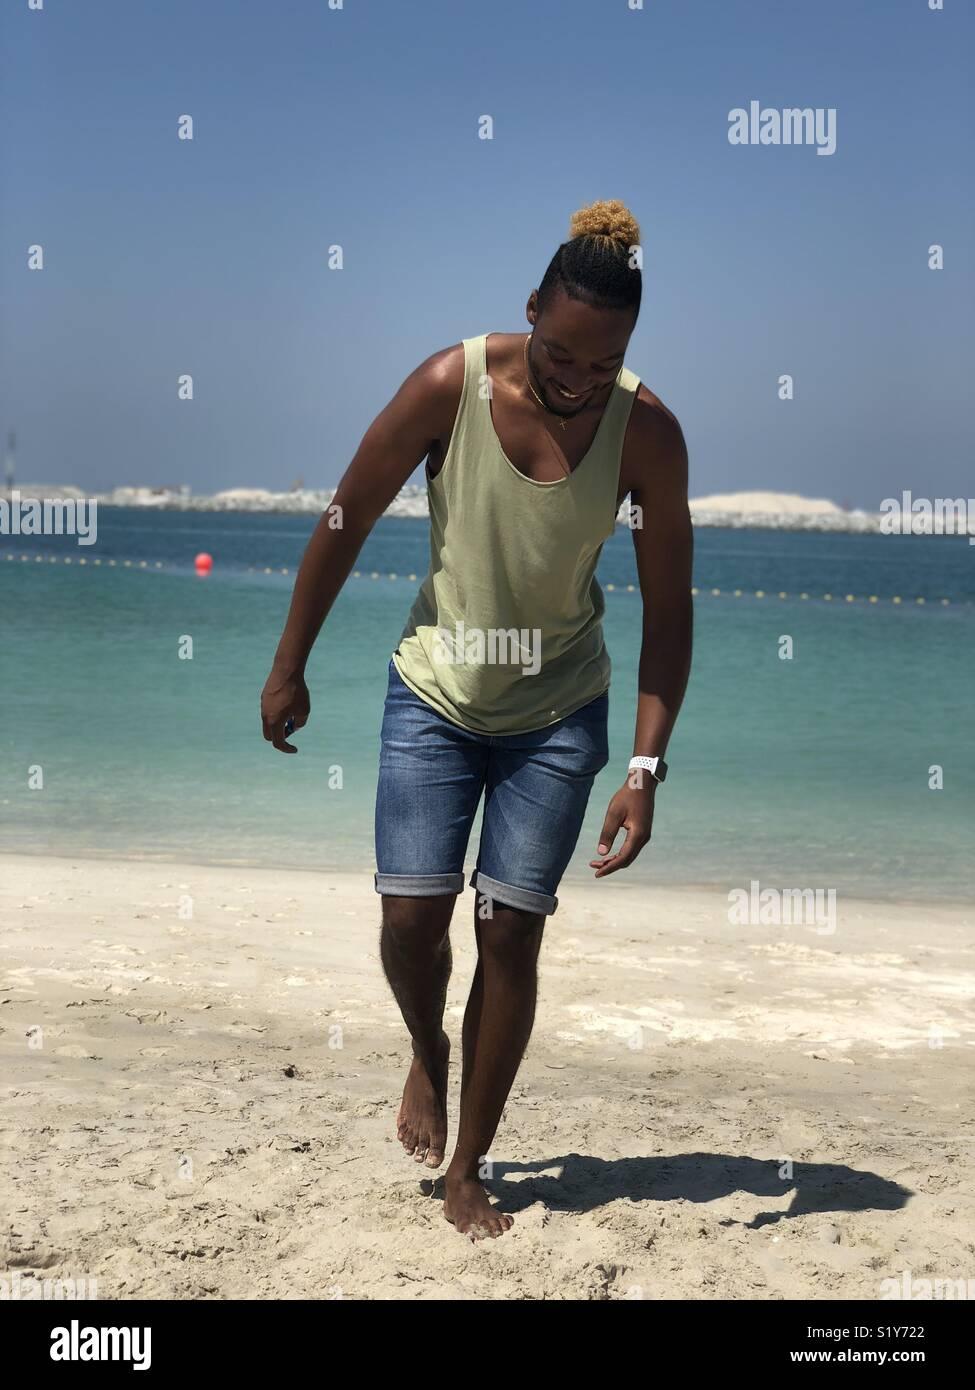 Vie sur la plage Photo Stock